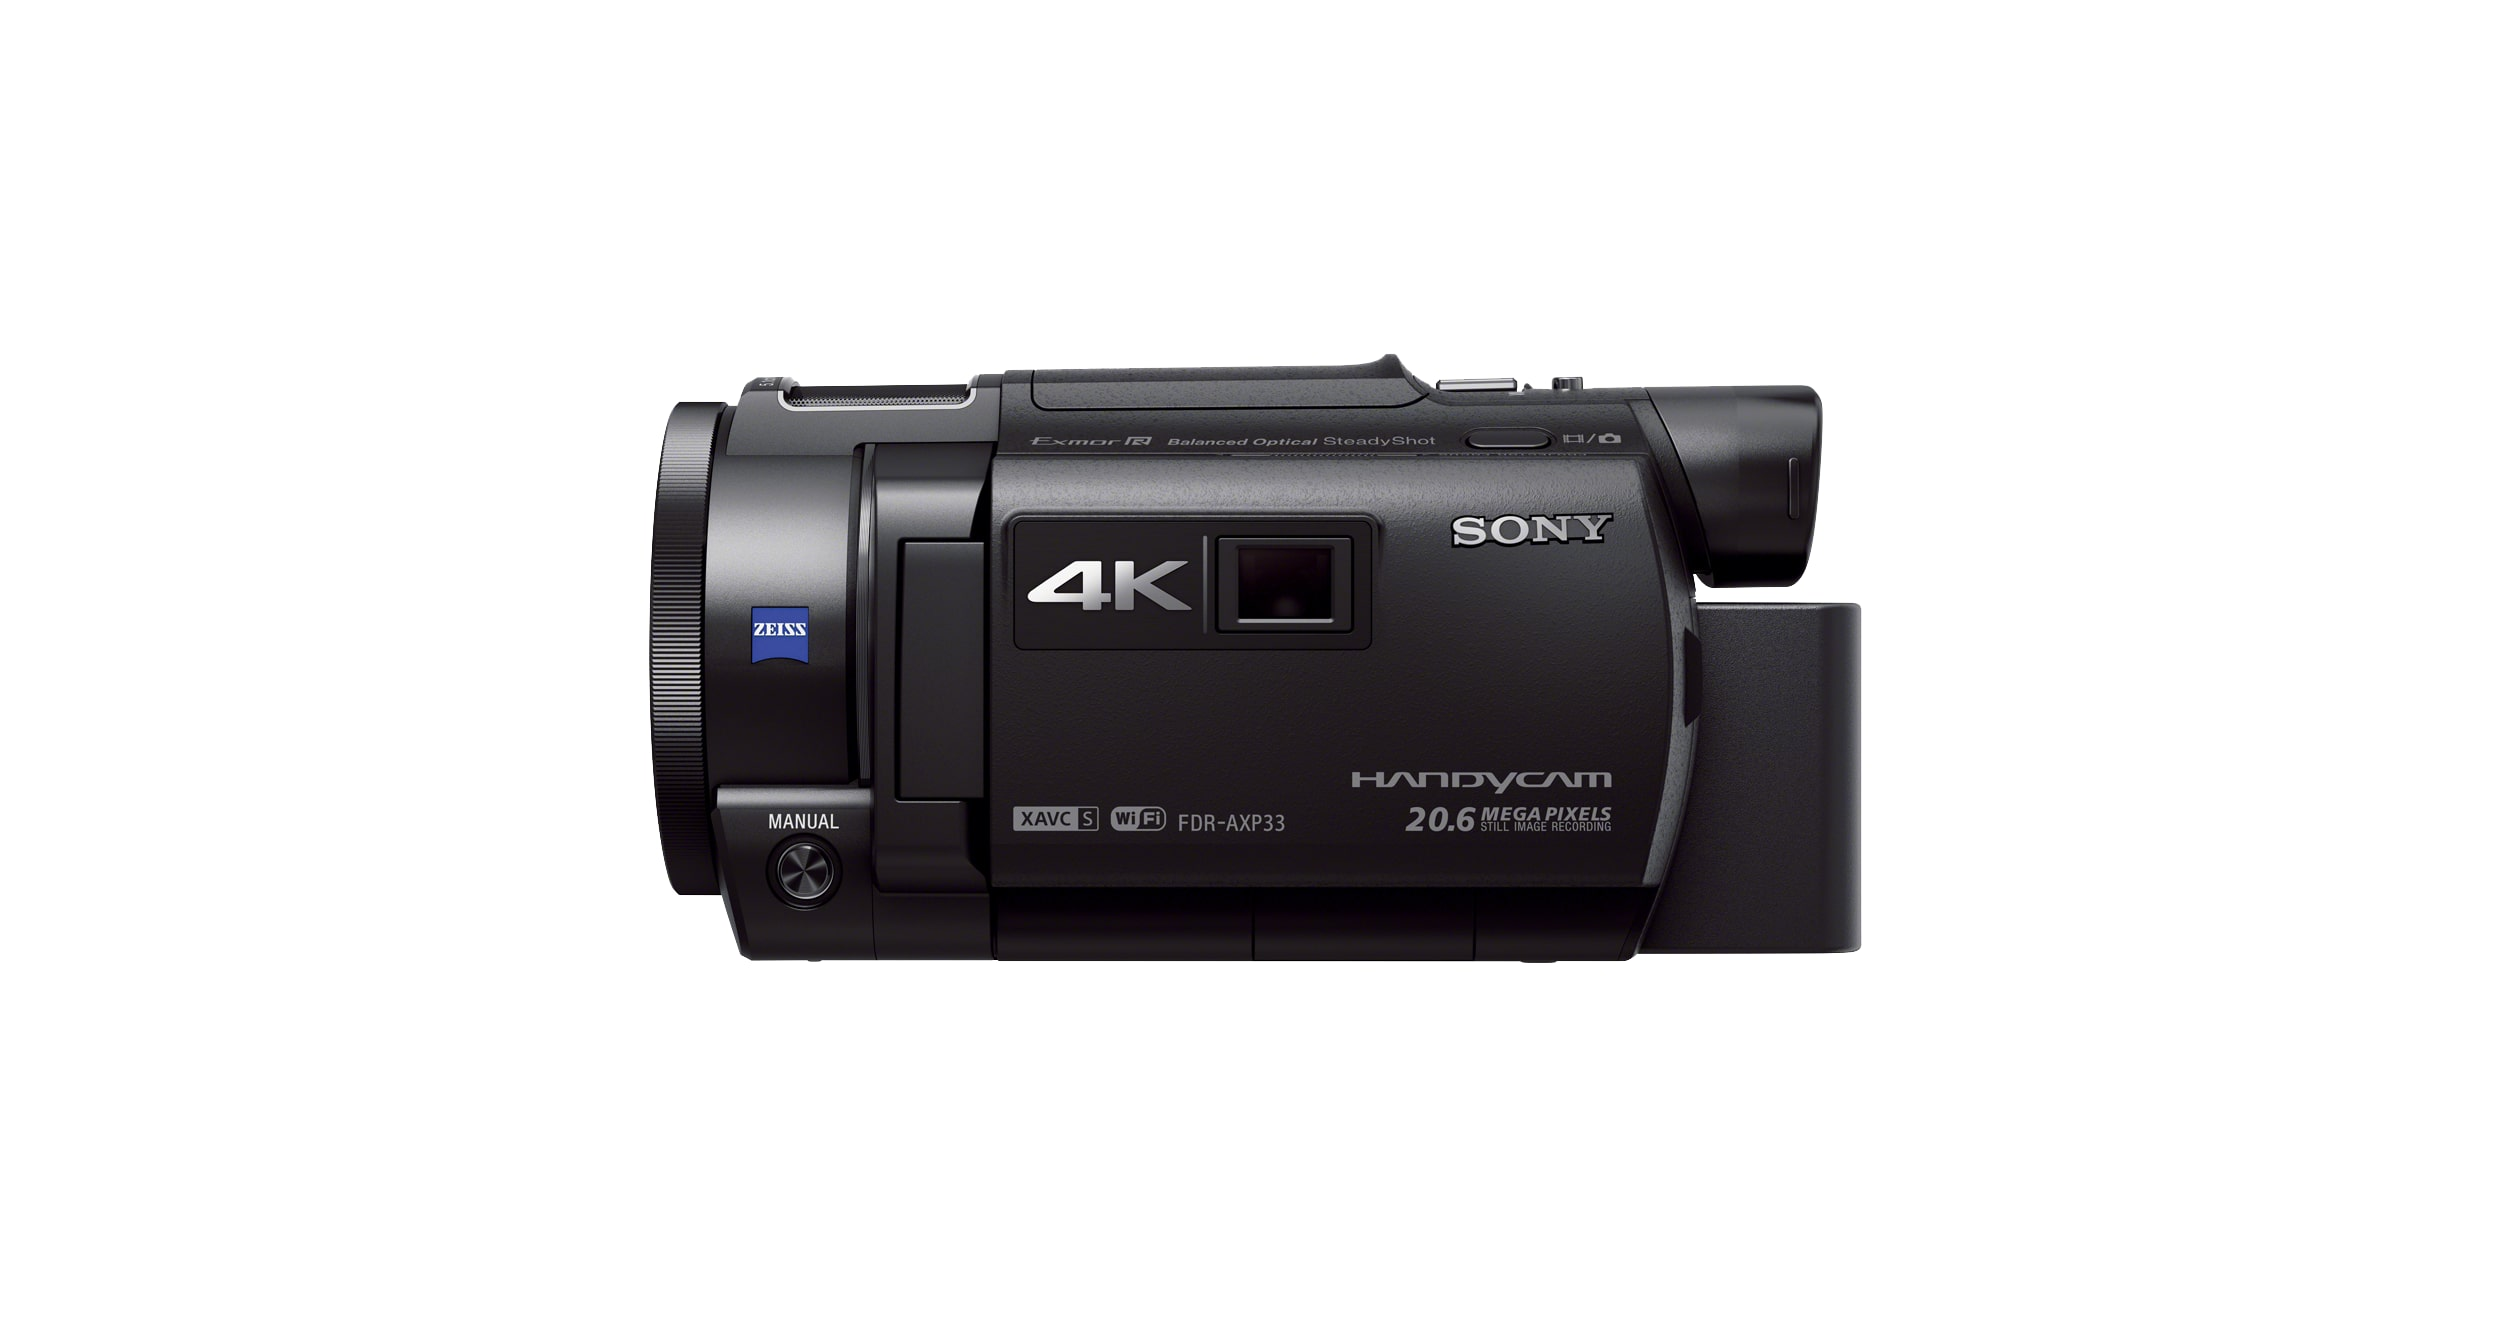 Fdr Axp33 Reviews Ratings Handycam Camcorders Sony Uk Hdr Pj810 Camcorder